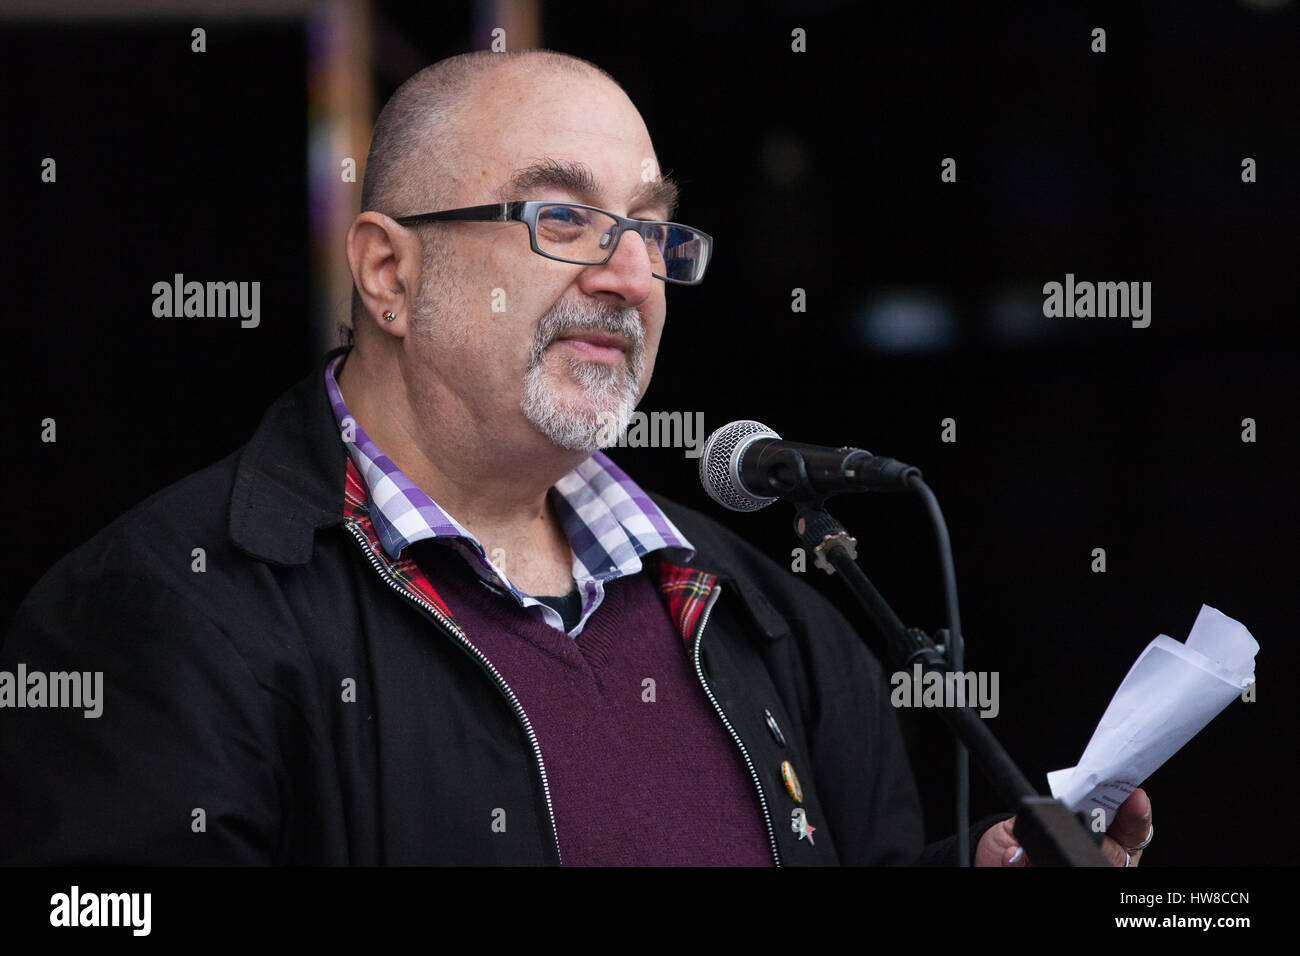 London, UK. 18th March, 2017. David Rosenberg of the Jewish Socialists' Group addresses thousands of demonstrators - Stock Image